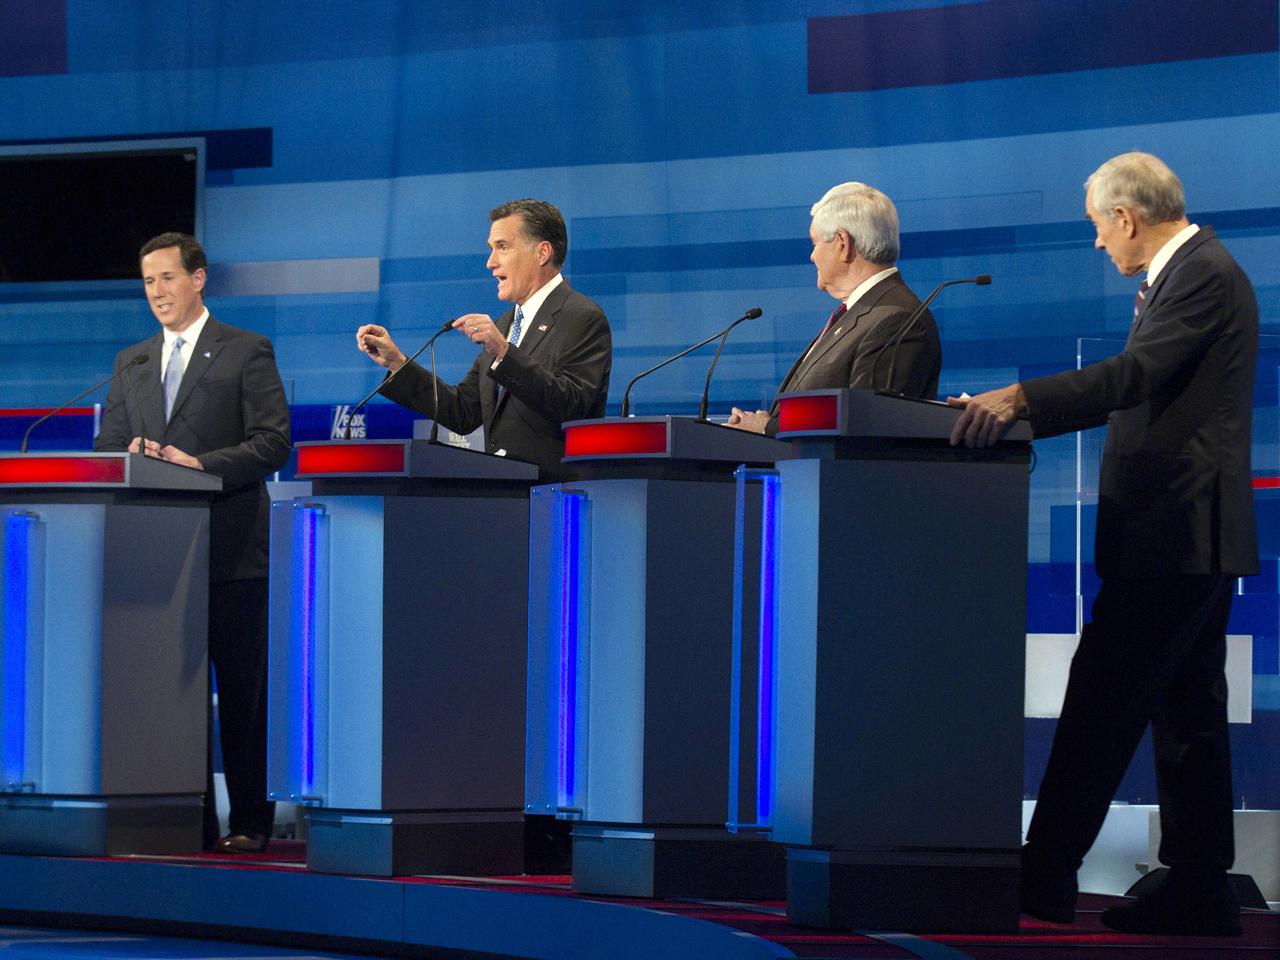 Politics and hypocrisy on the campaign trail - CBS News